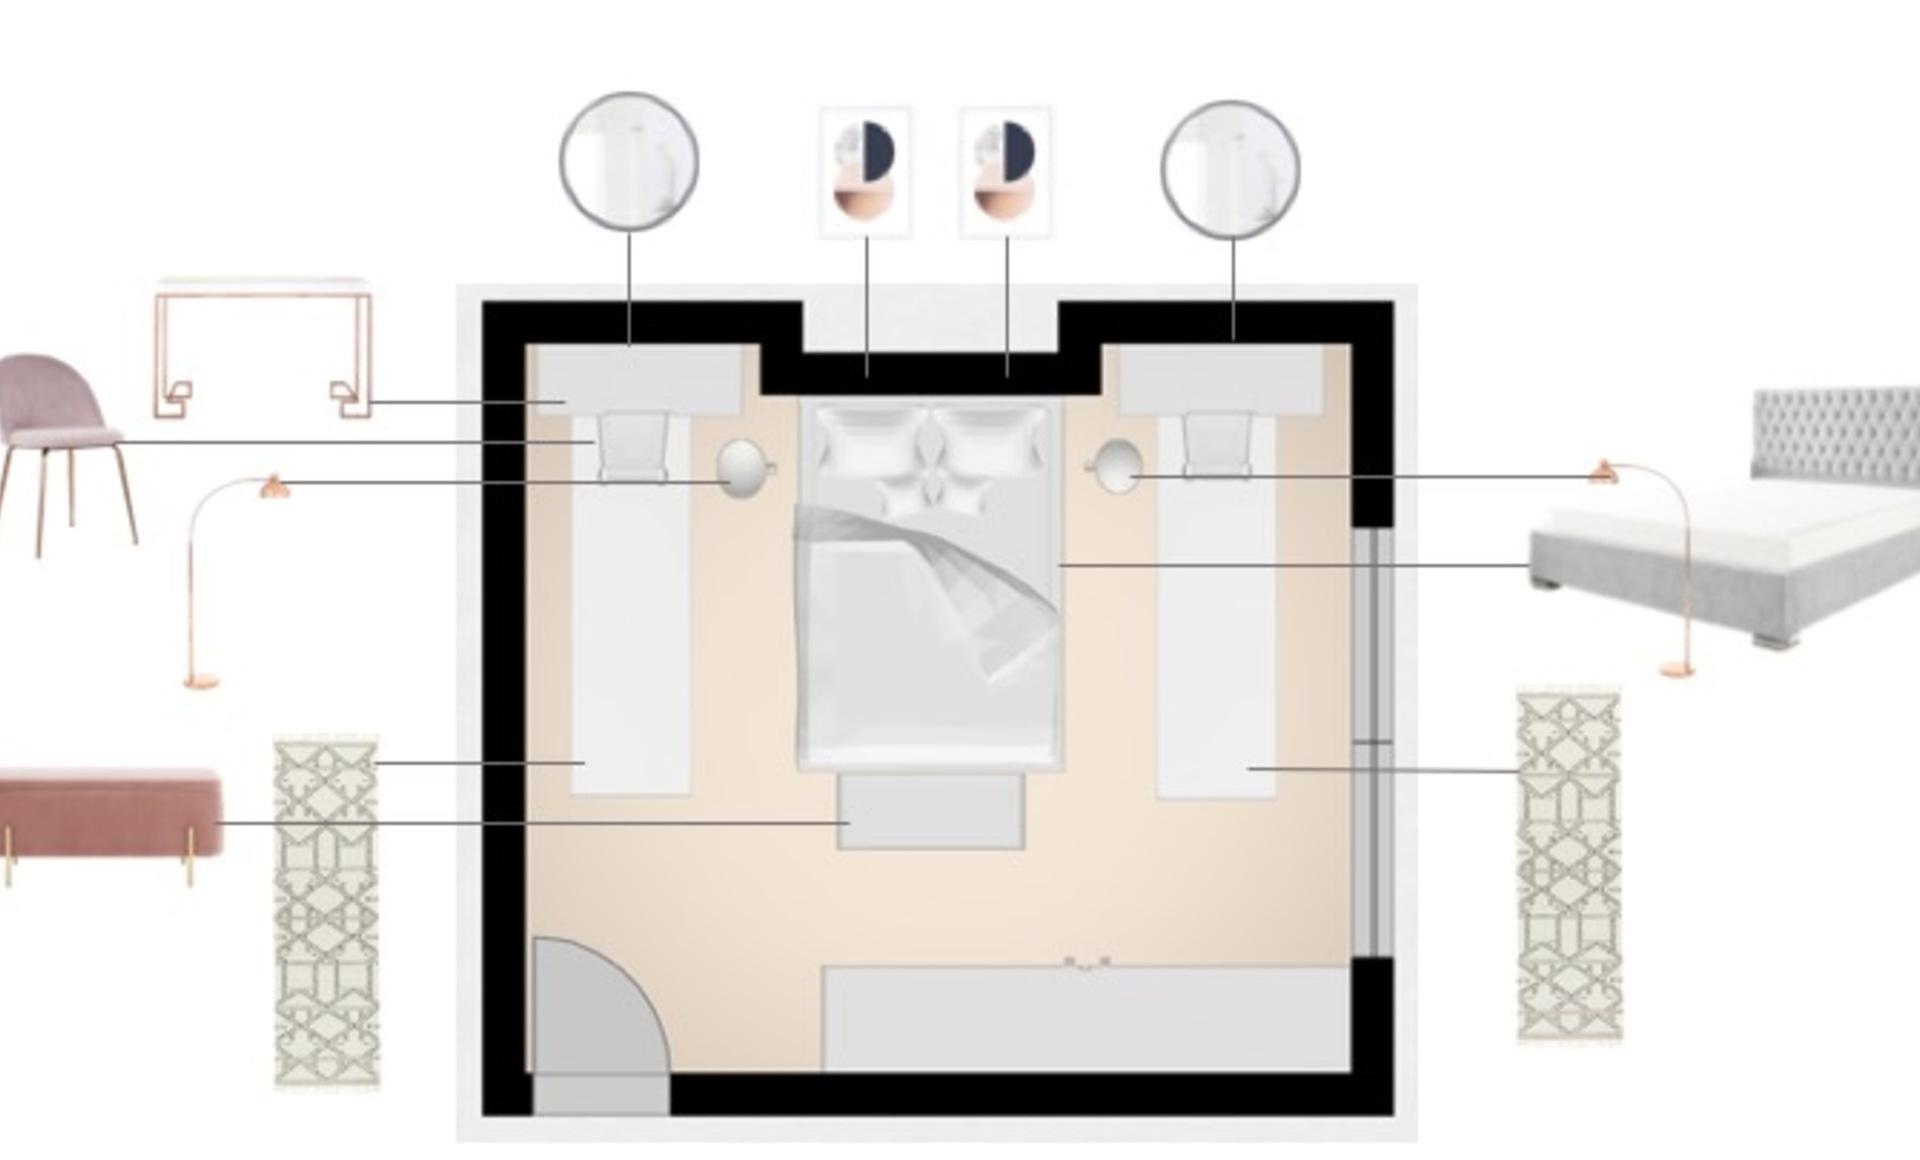 Mbr oliviatw bedroom floorplan